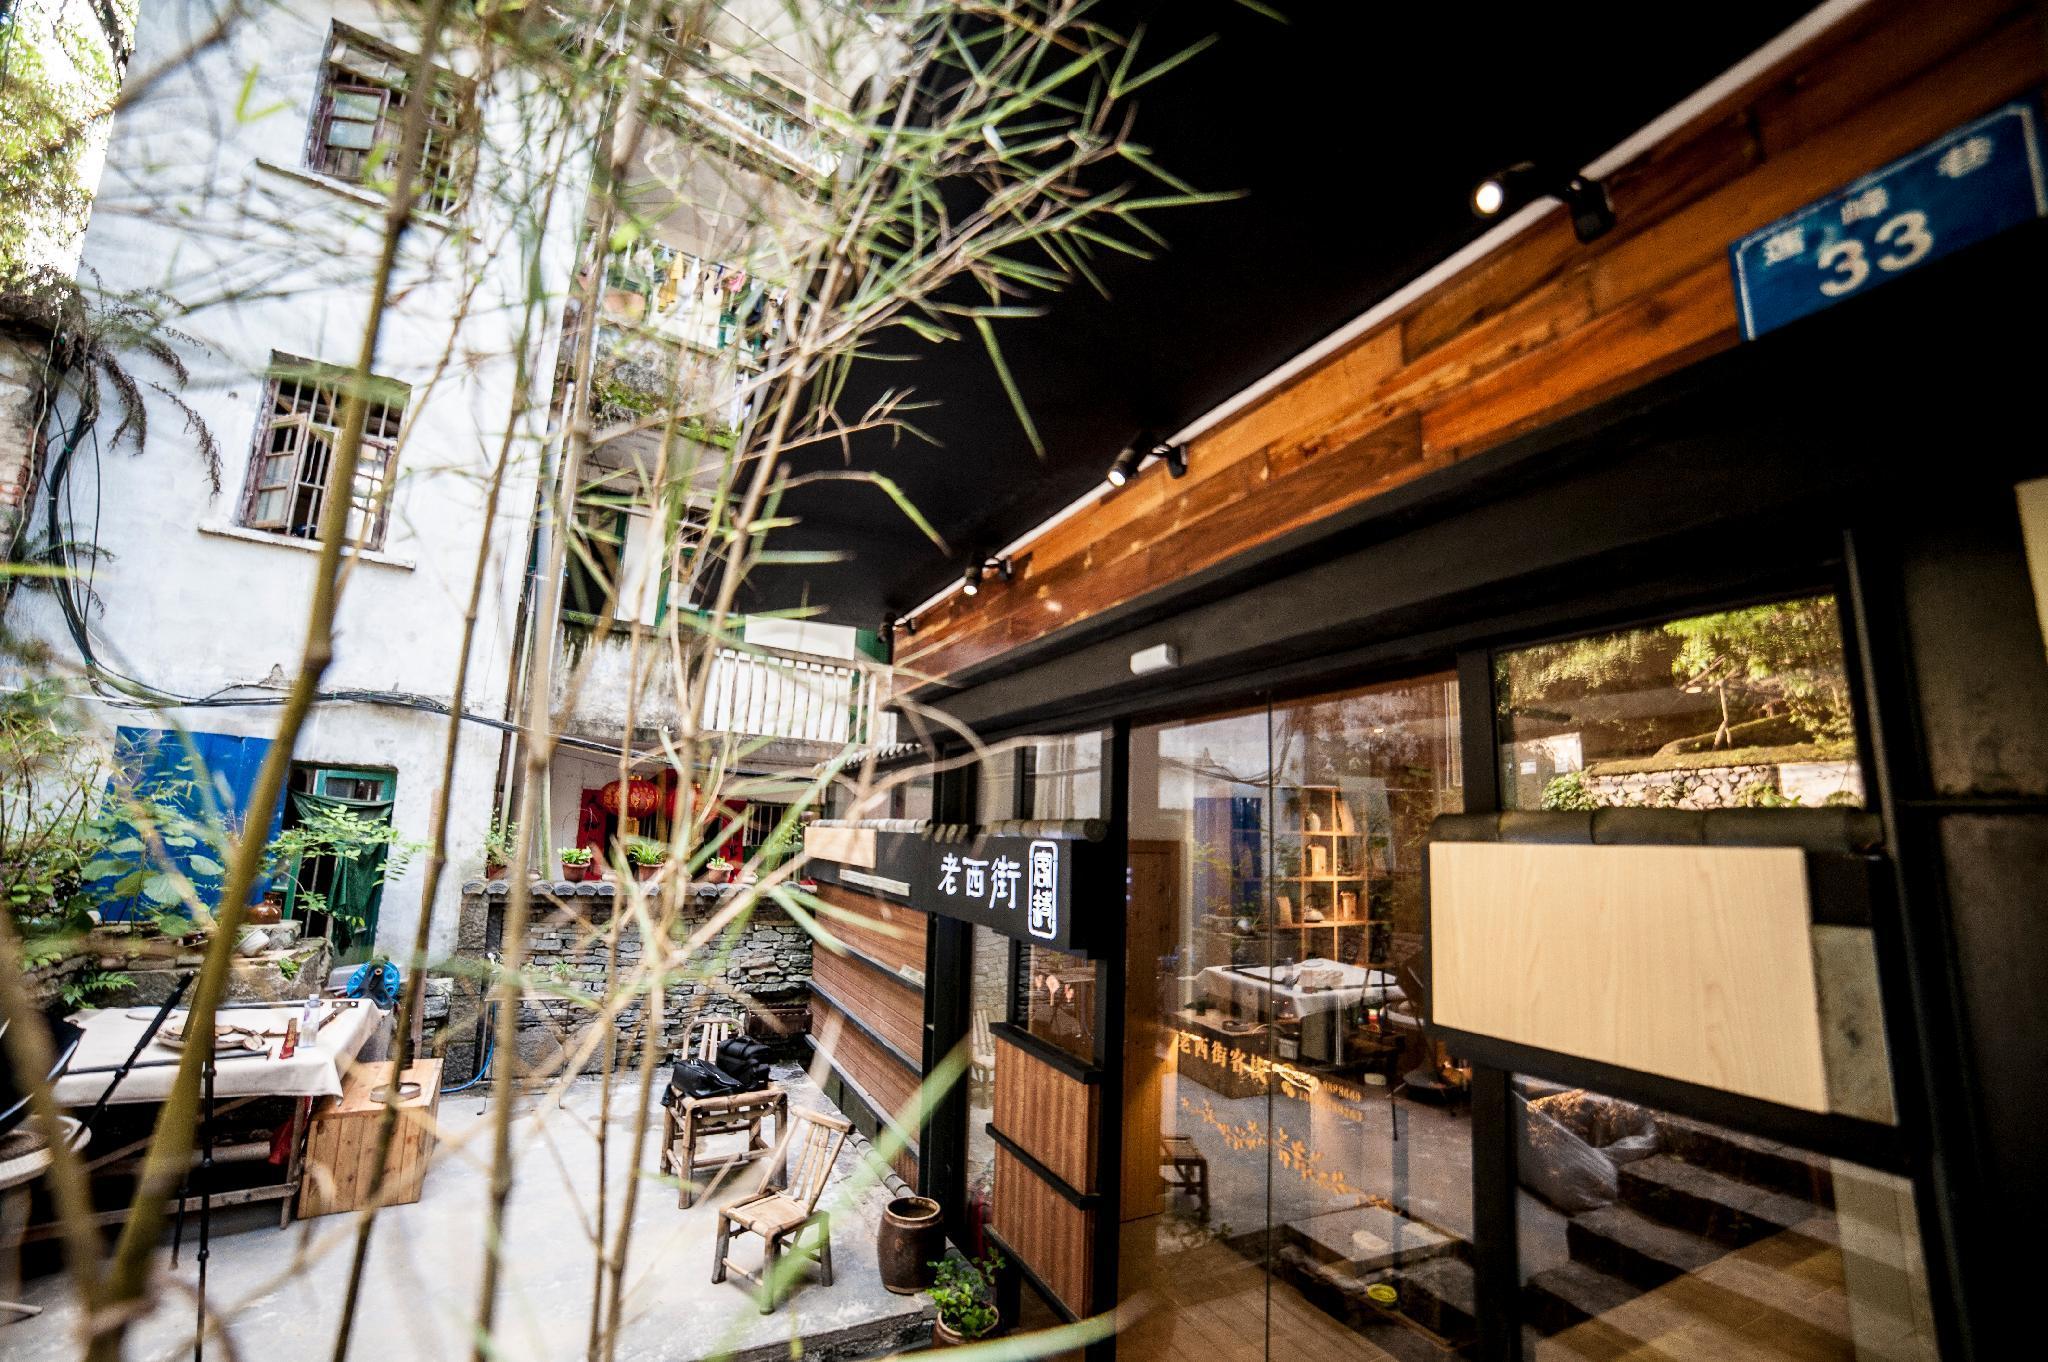 Zen Tea House West Street Yang Shuo